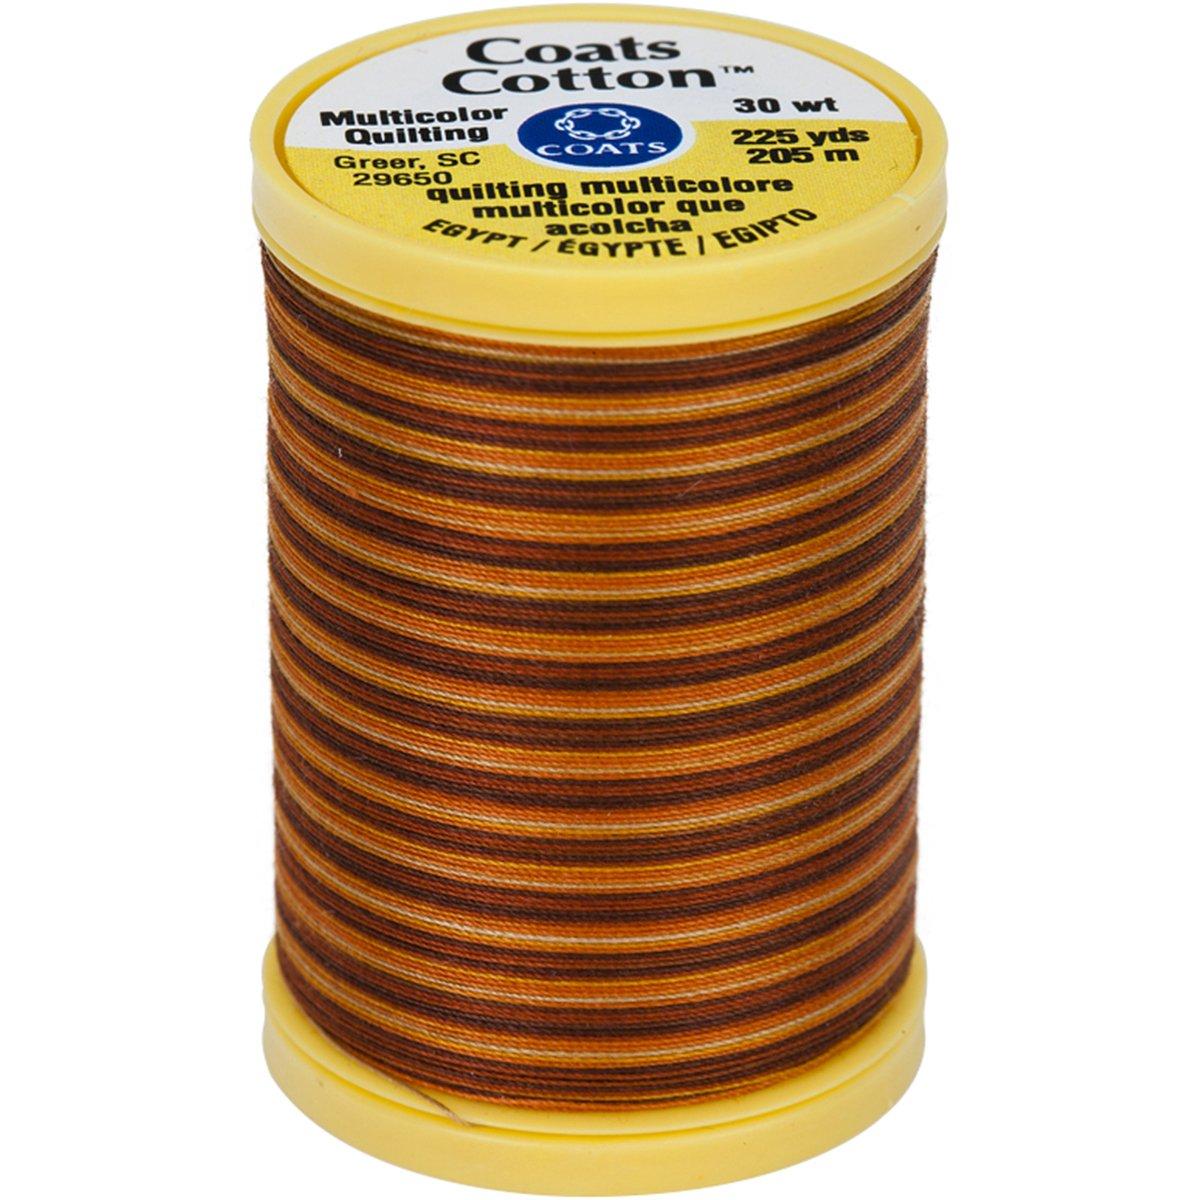 10pcs Assorted Color Elastic Spaghetti Glitter Ribbon Bra Straps Cross Shape 42cm Length Bra Accessories WB61 Random Mix colors